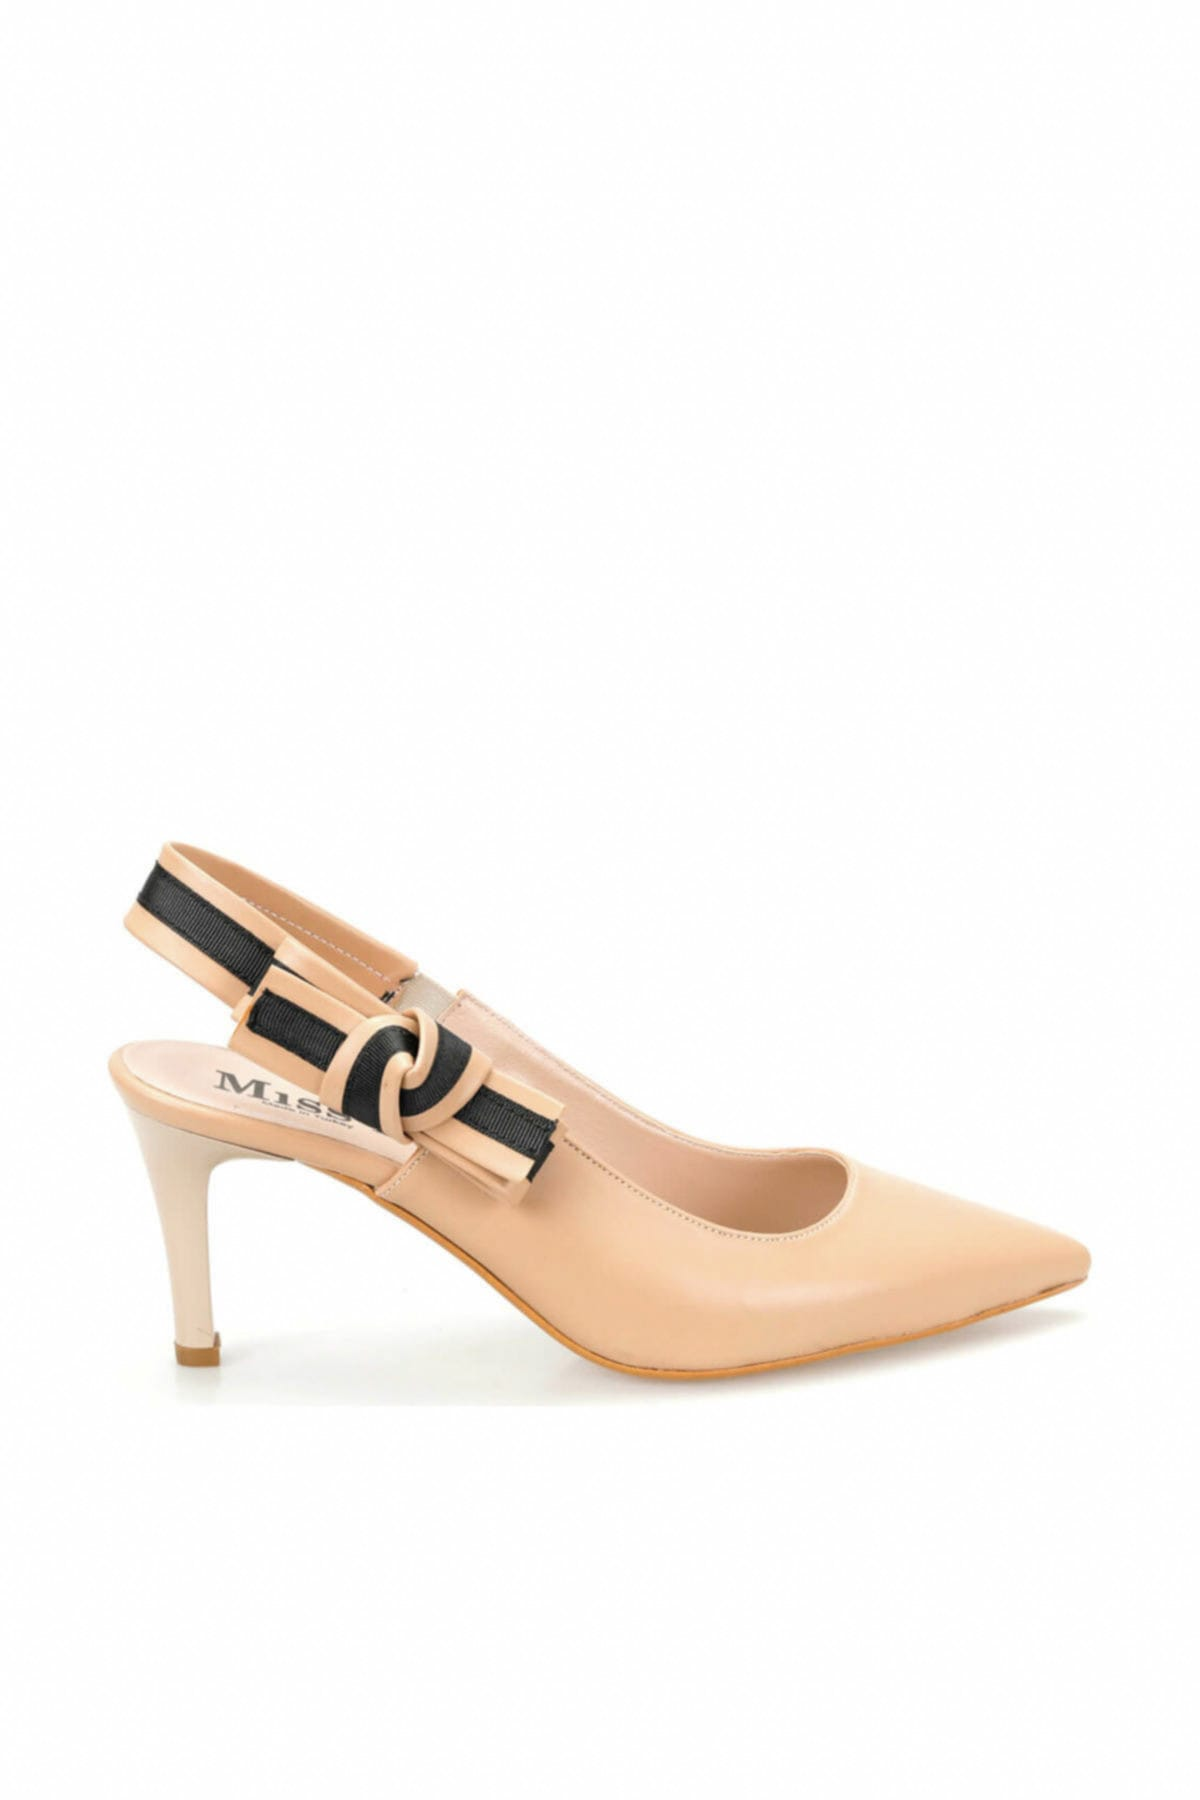 Miss F Ds19074 Bej Kadın Topuklu Ayakkabı 100382790 2